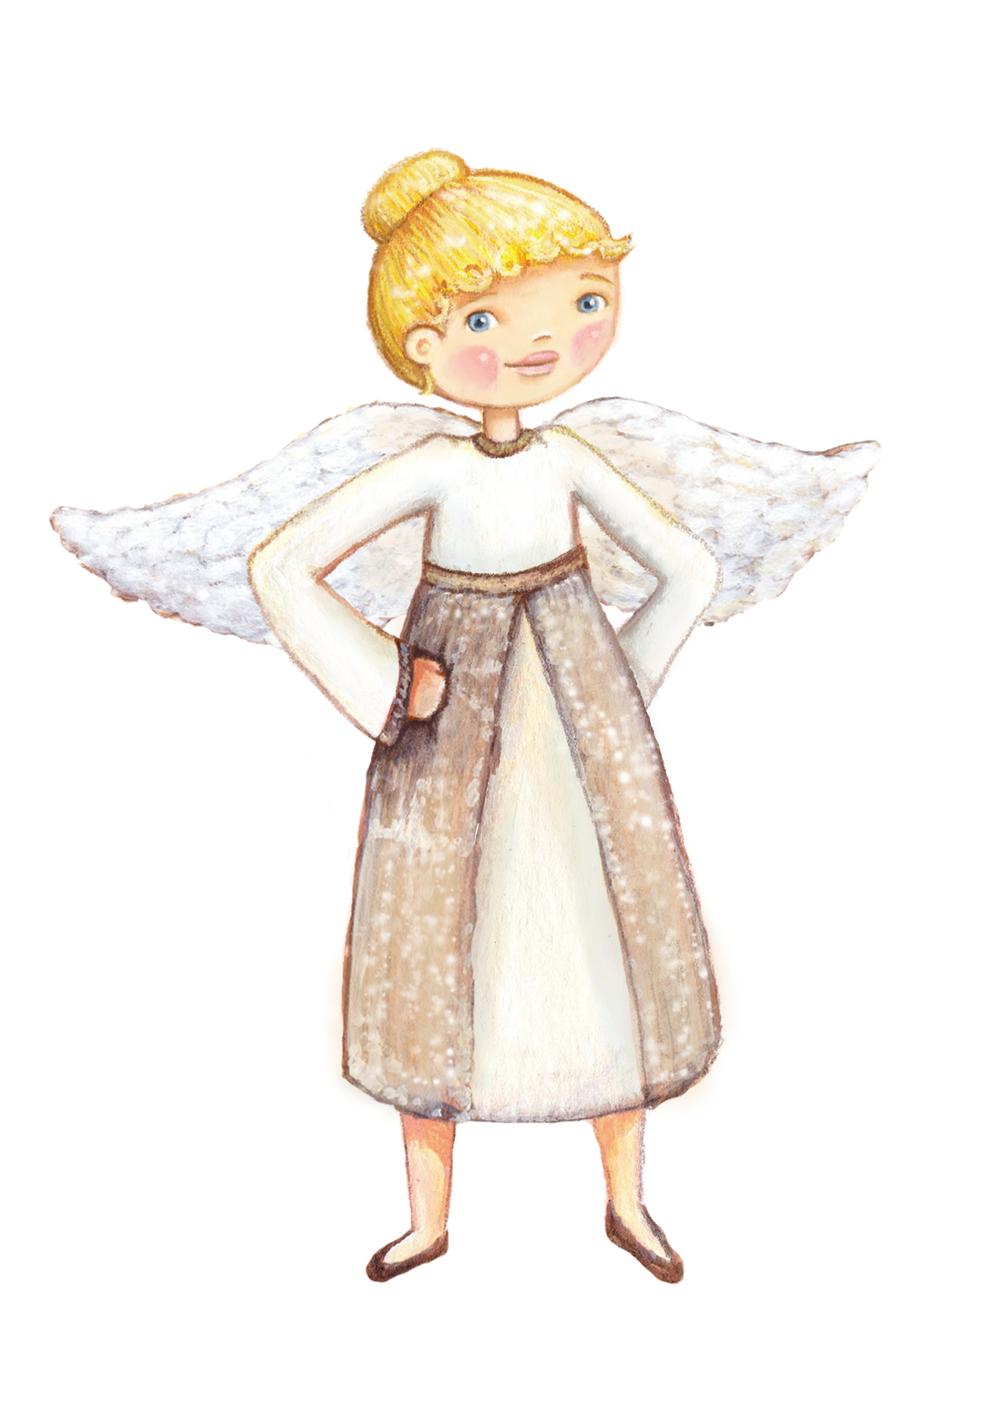 the angel guardian